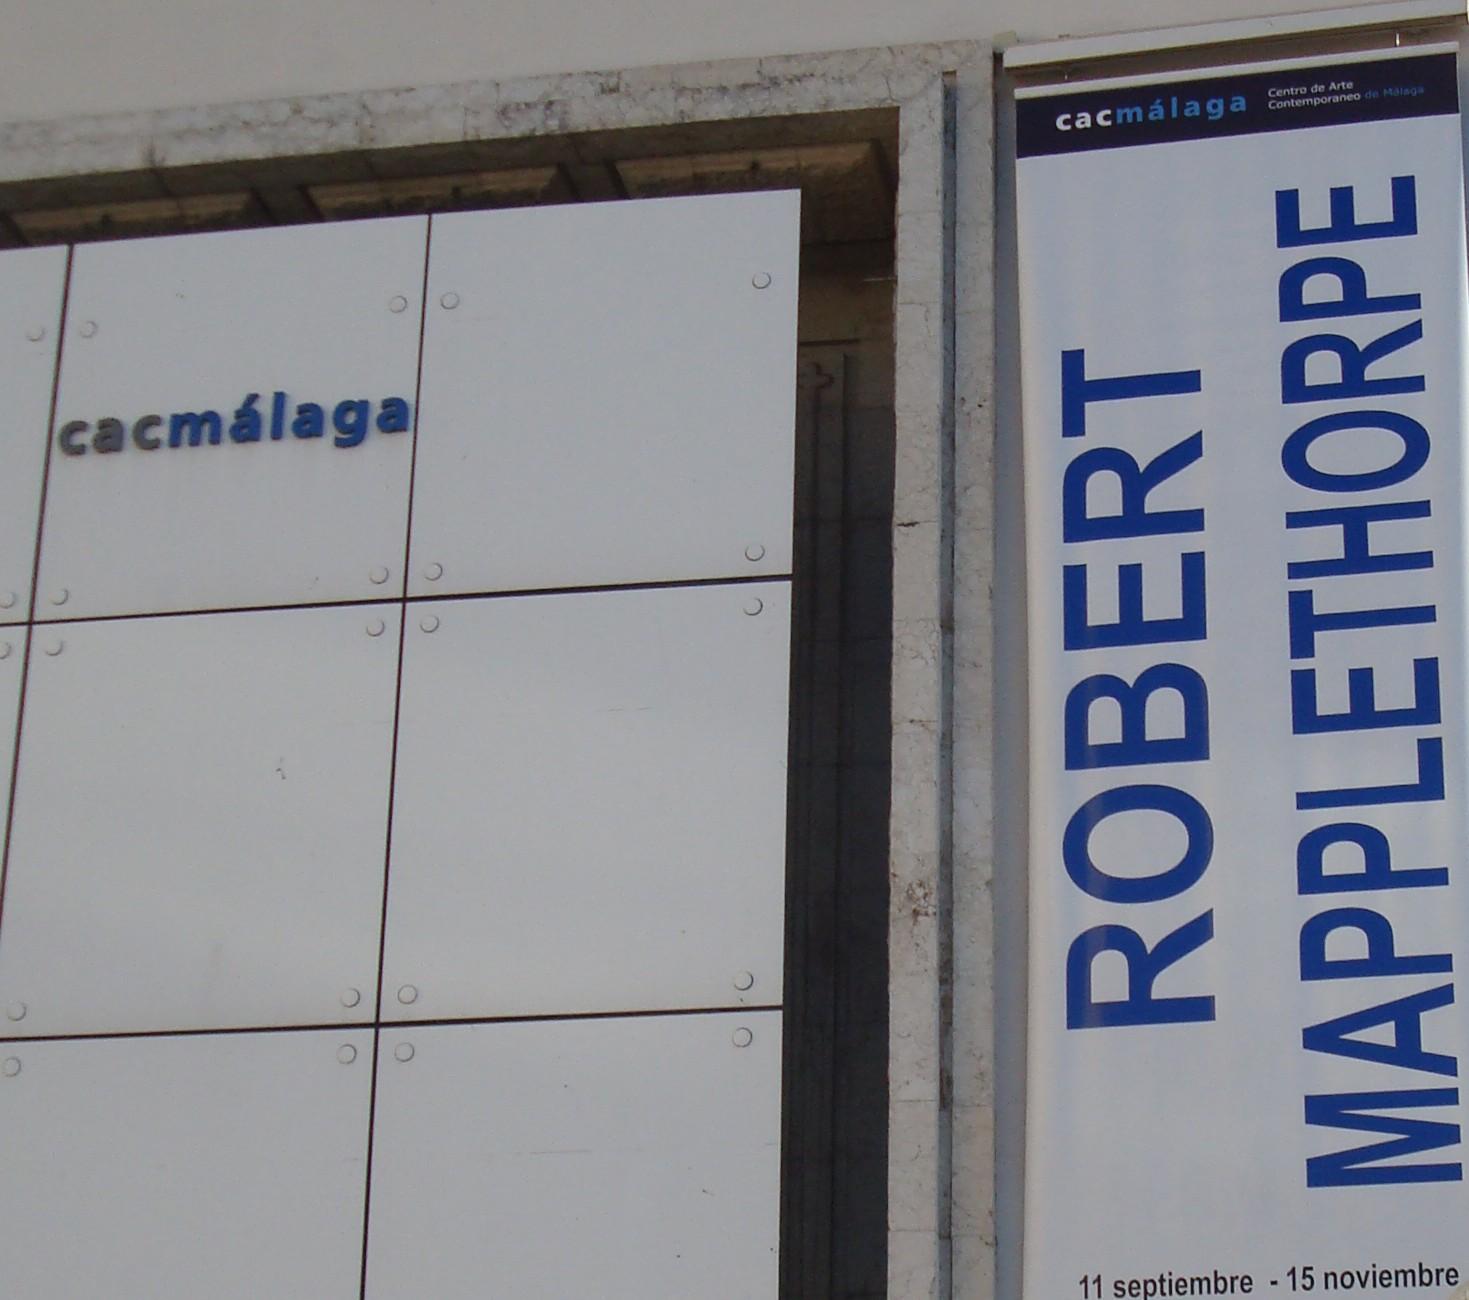 Cac_robert_mapplethorpe_malaga_capital_www.andrewforbes.com (7)